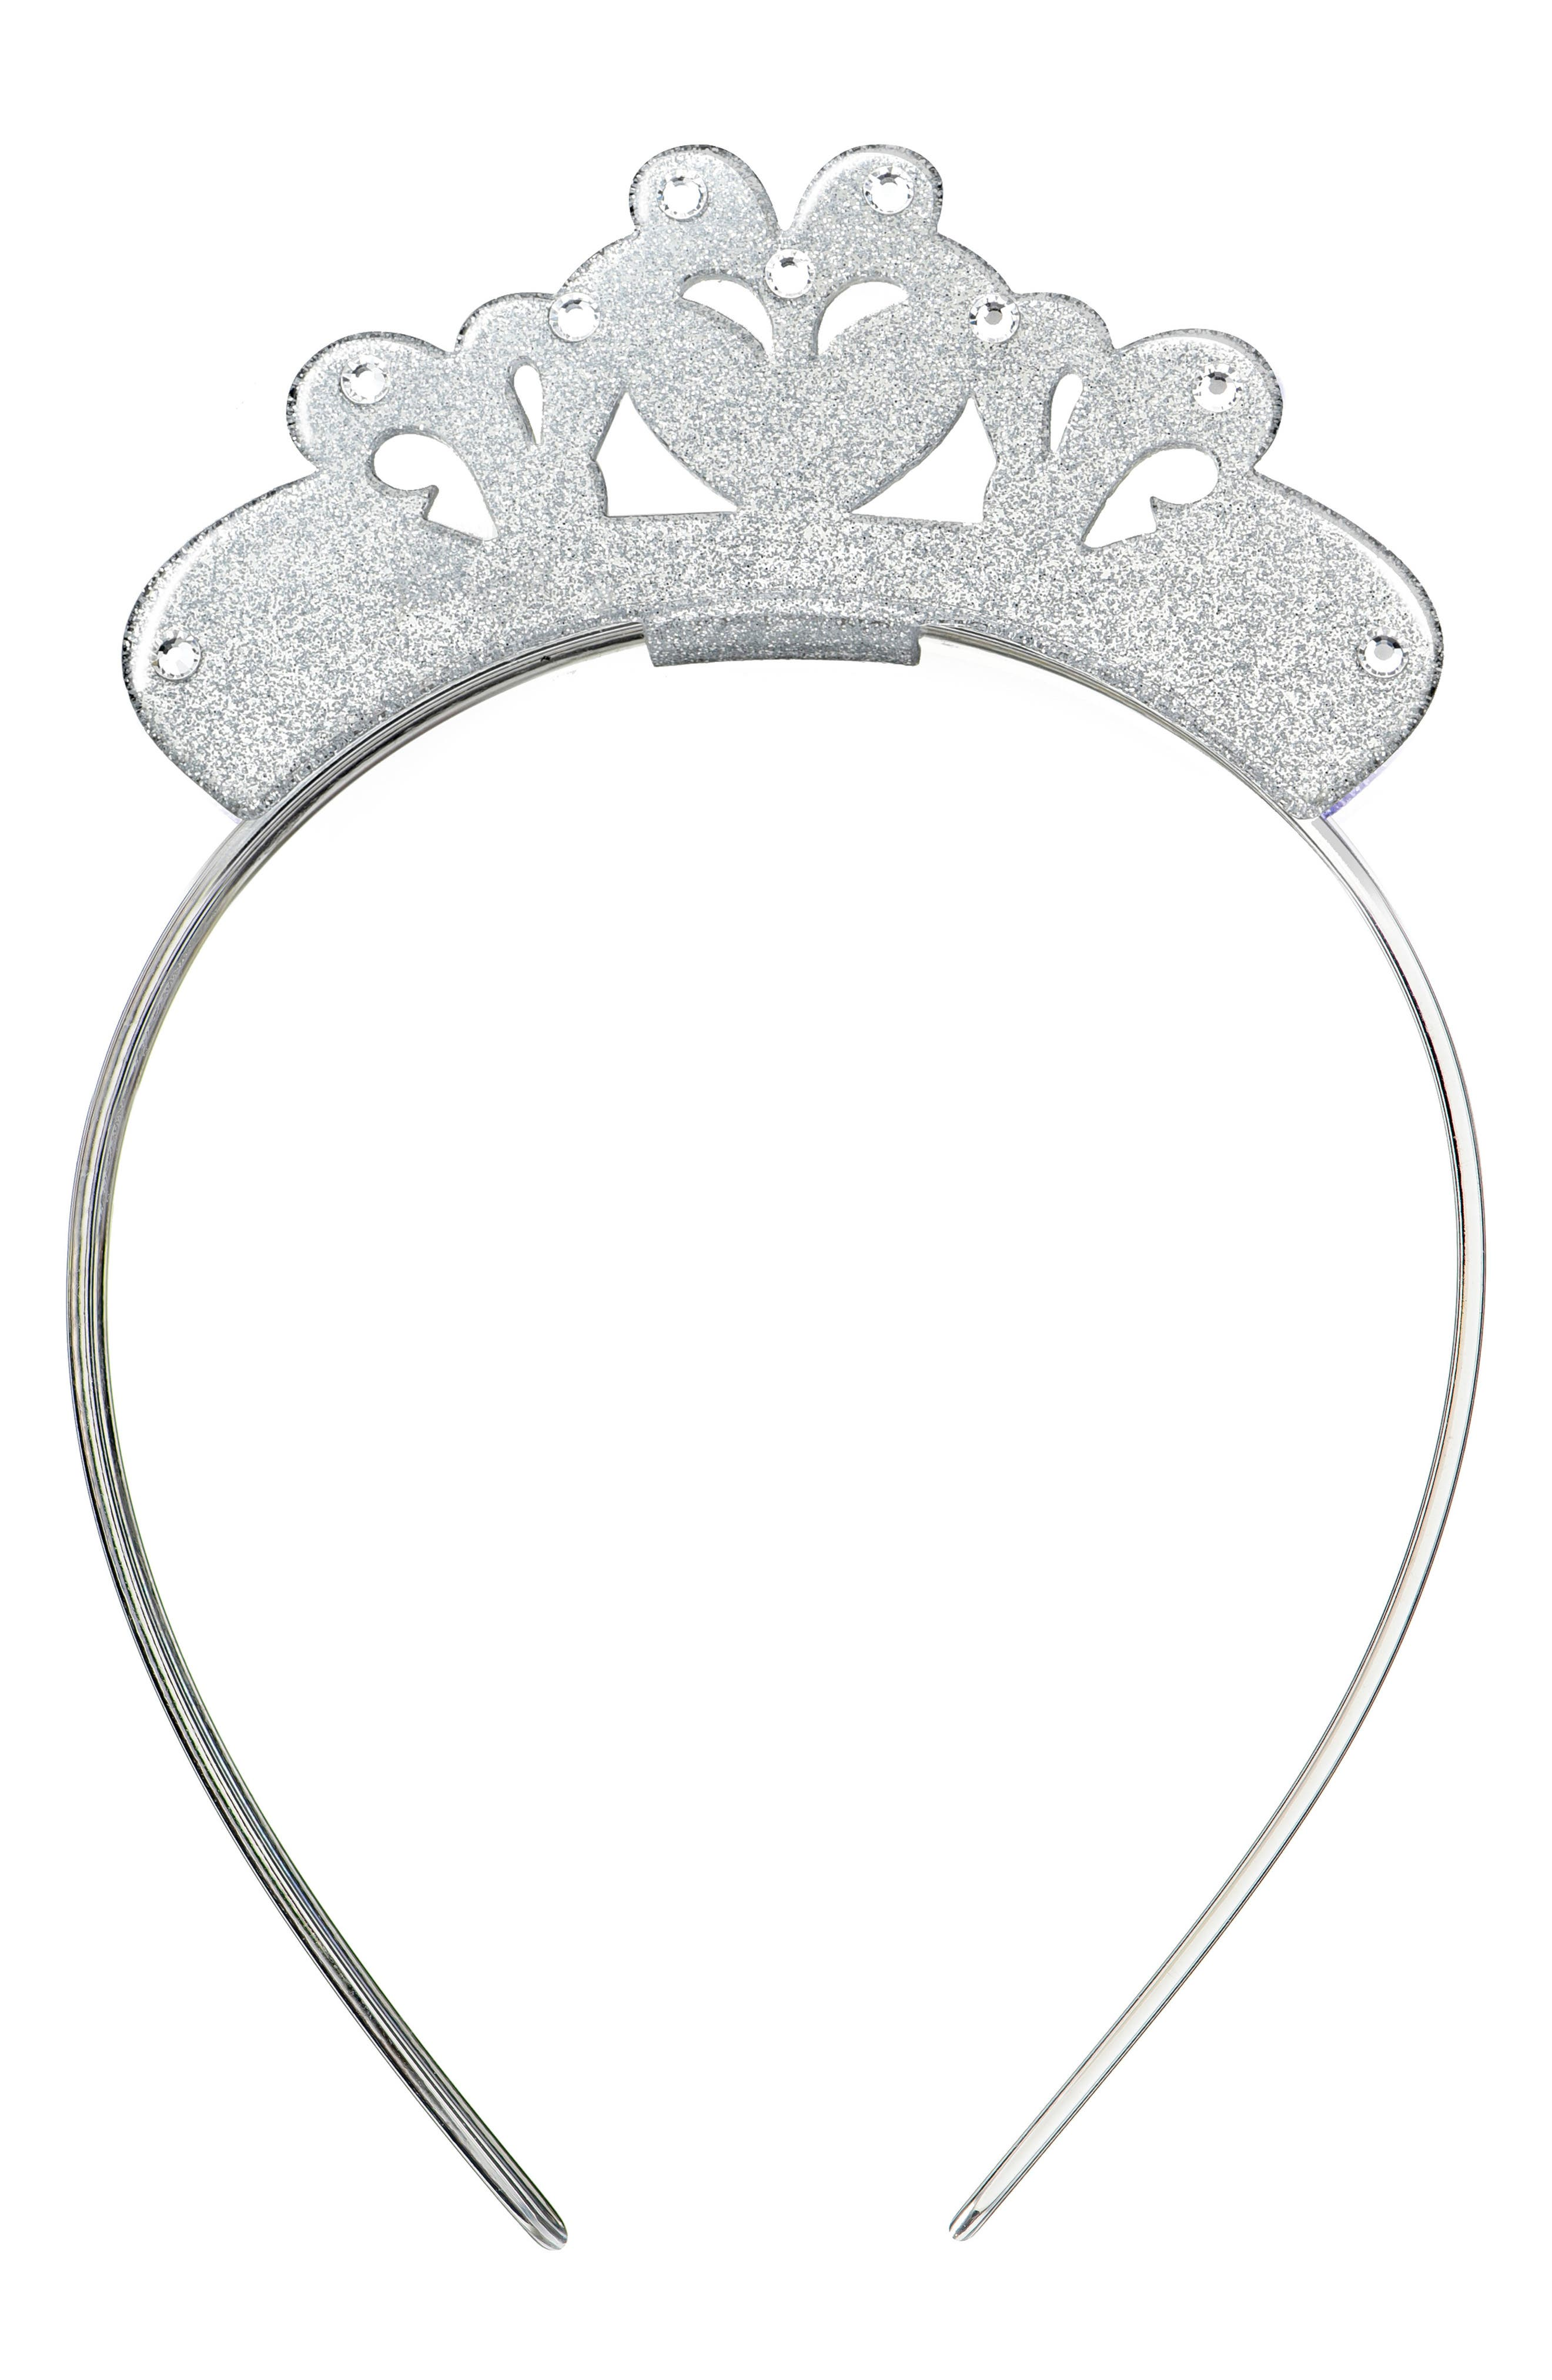 Main Image - Lilies & Roses NY Crown Headband